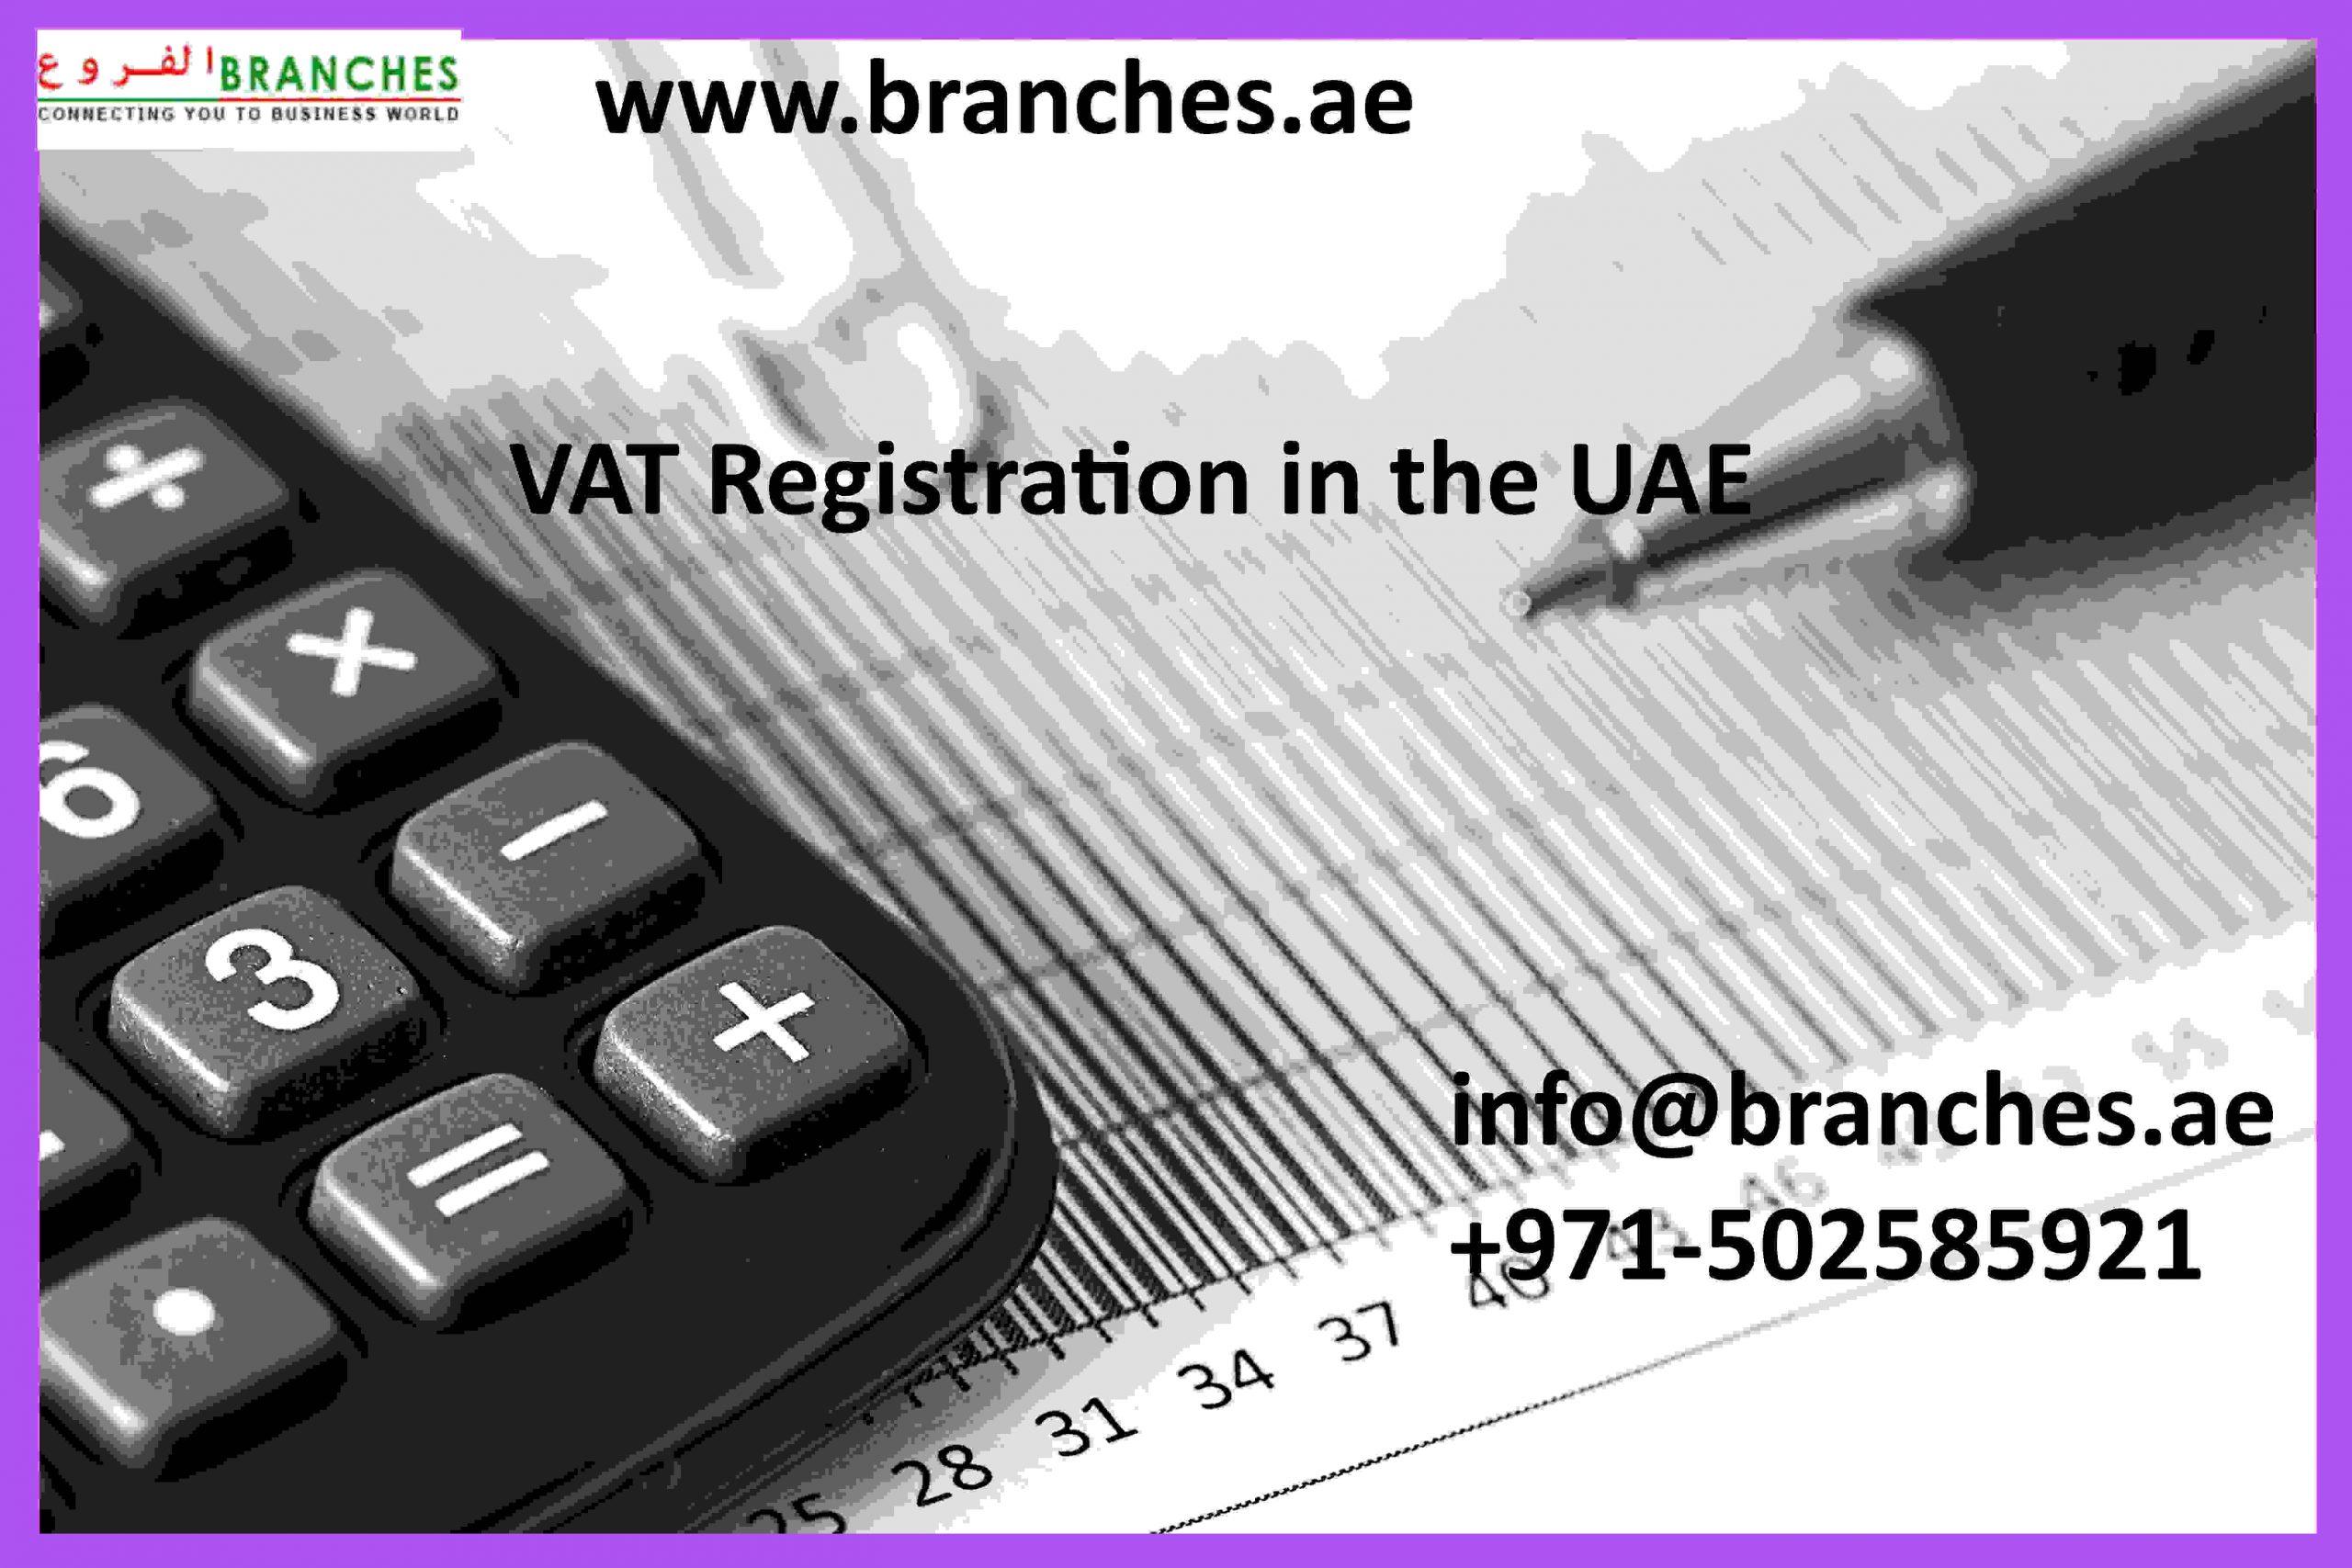 VAT Registration in the UAE